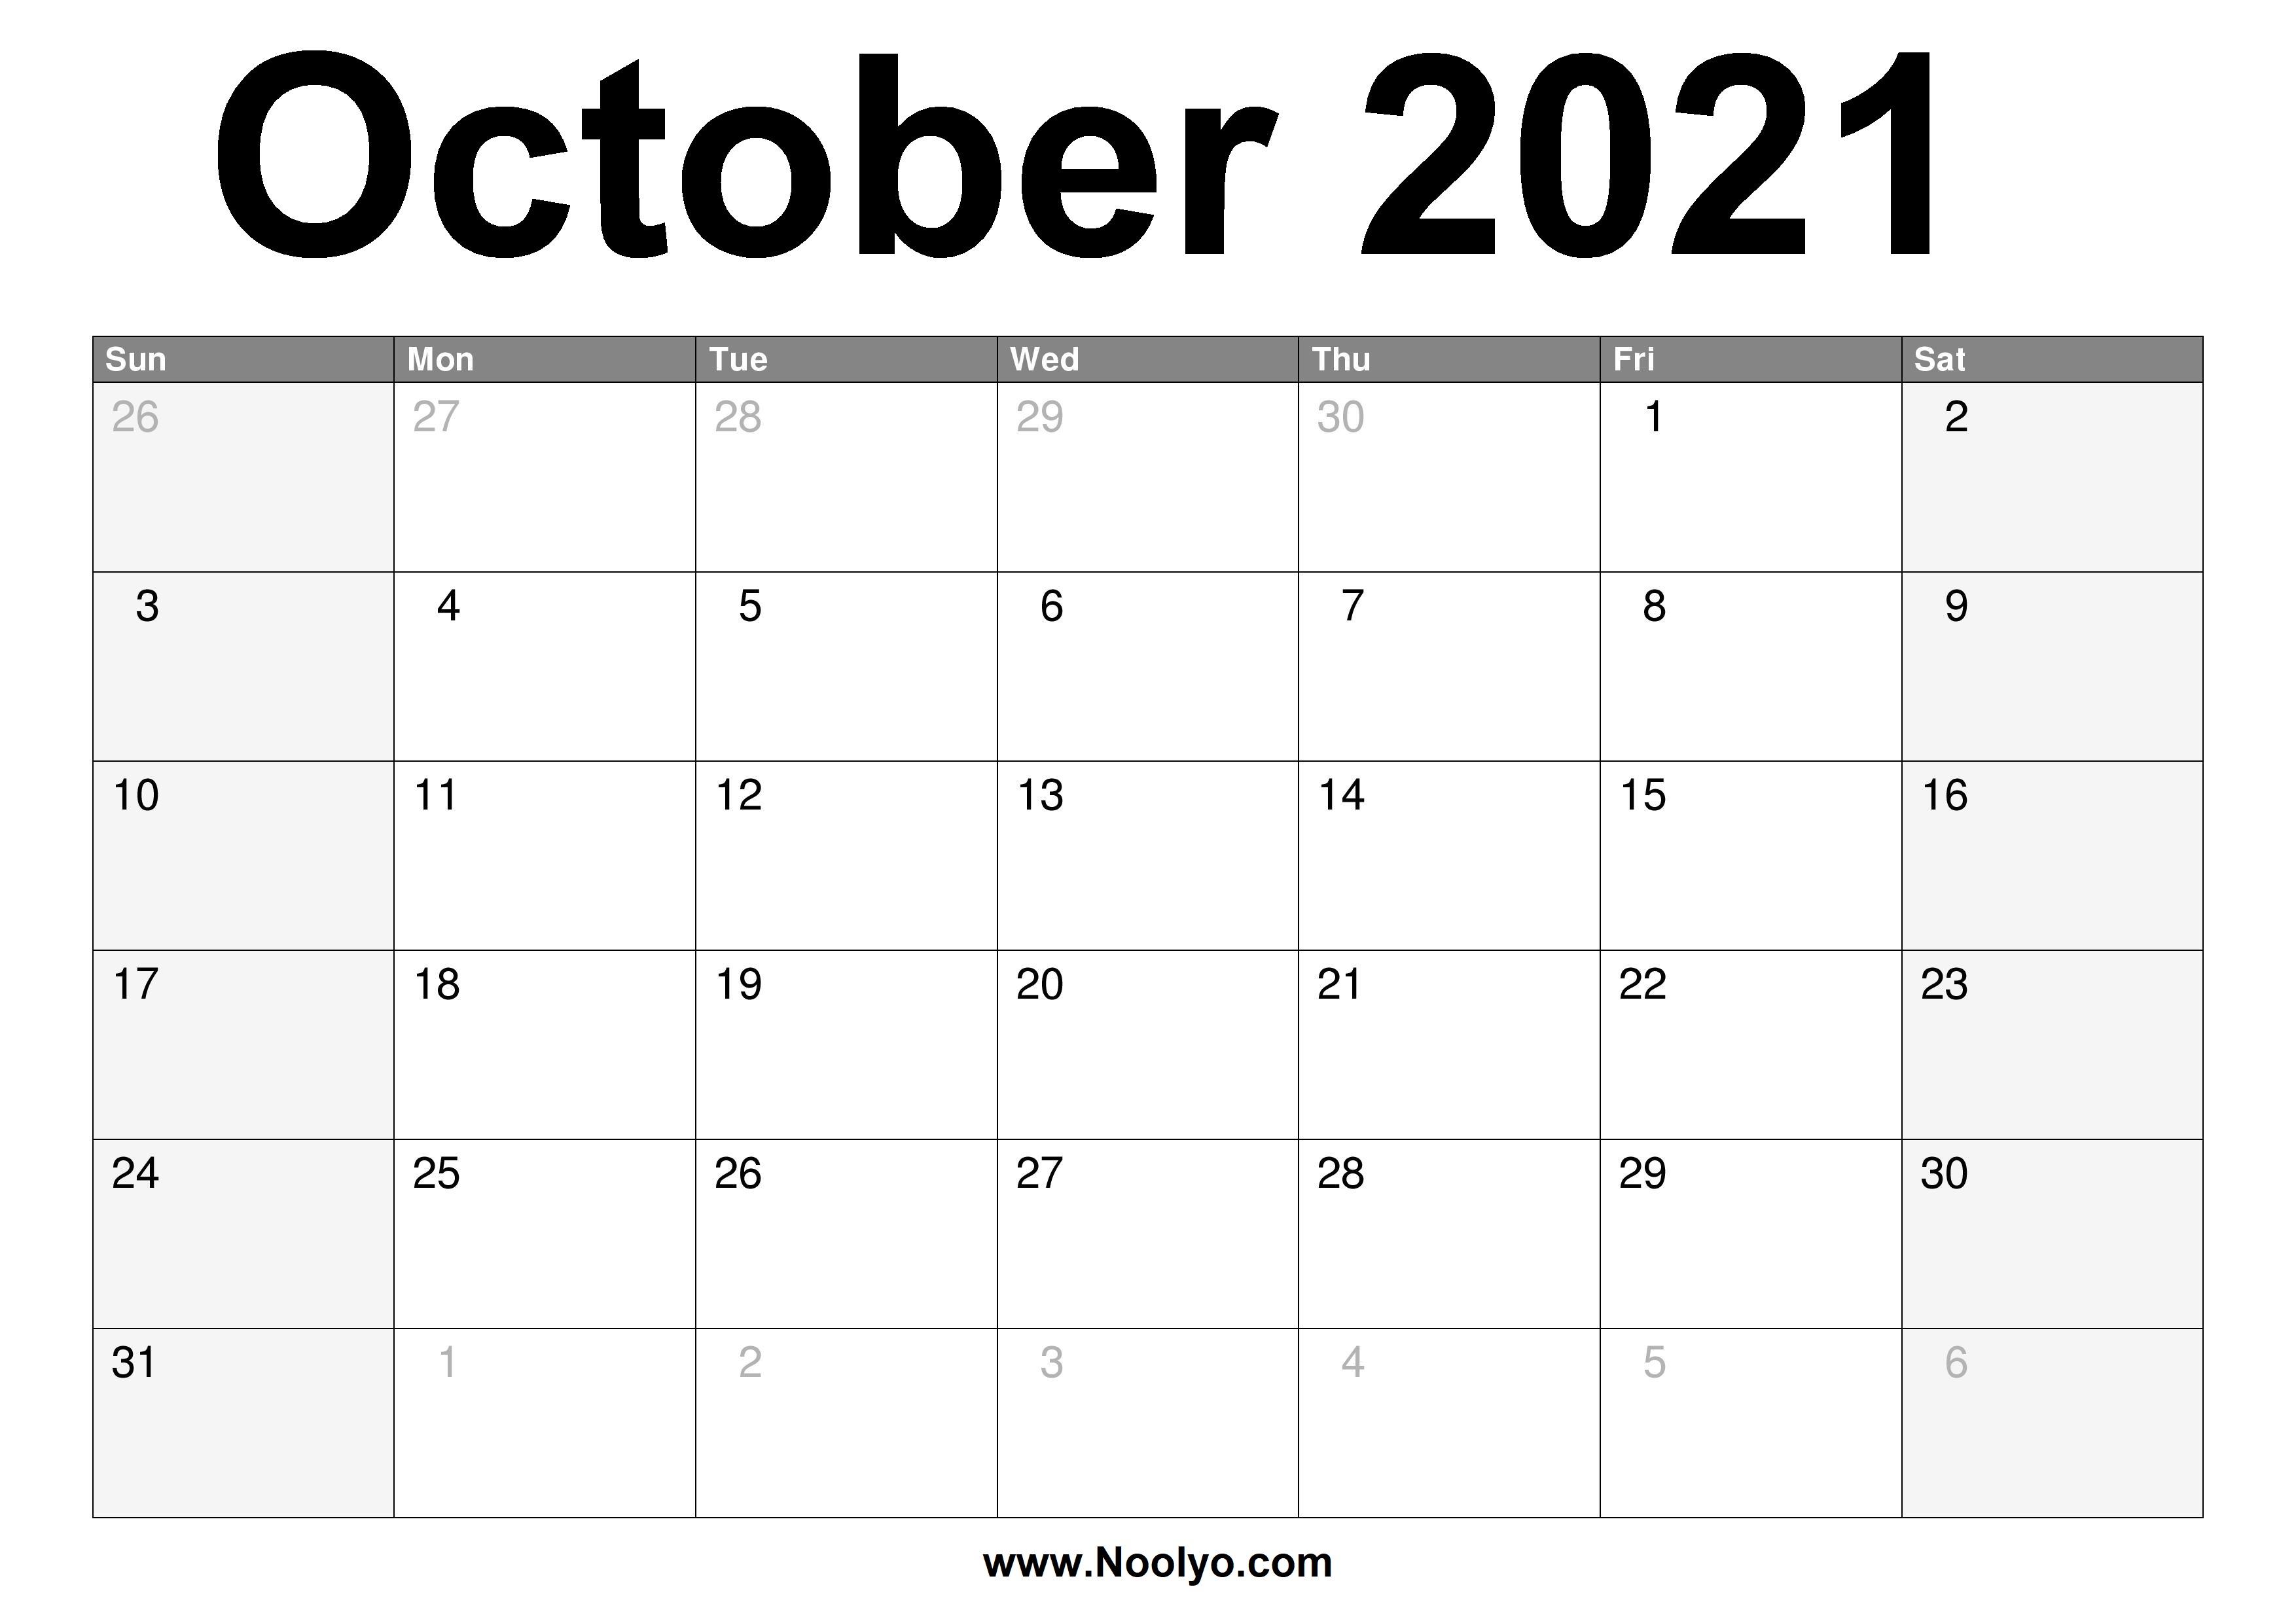 October 2021 Calendar Printable - Free Download - Noolyo.com